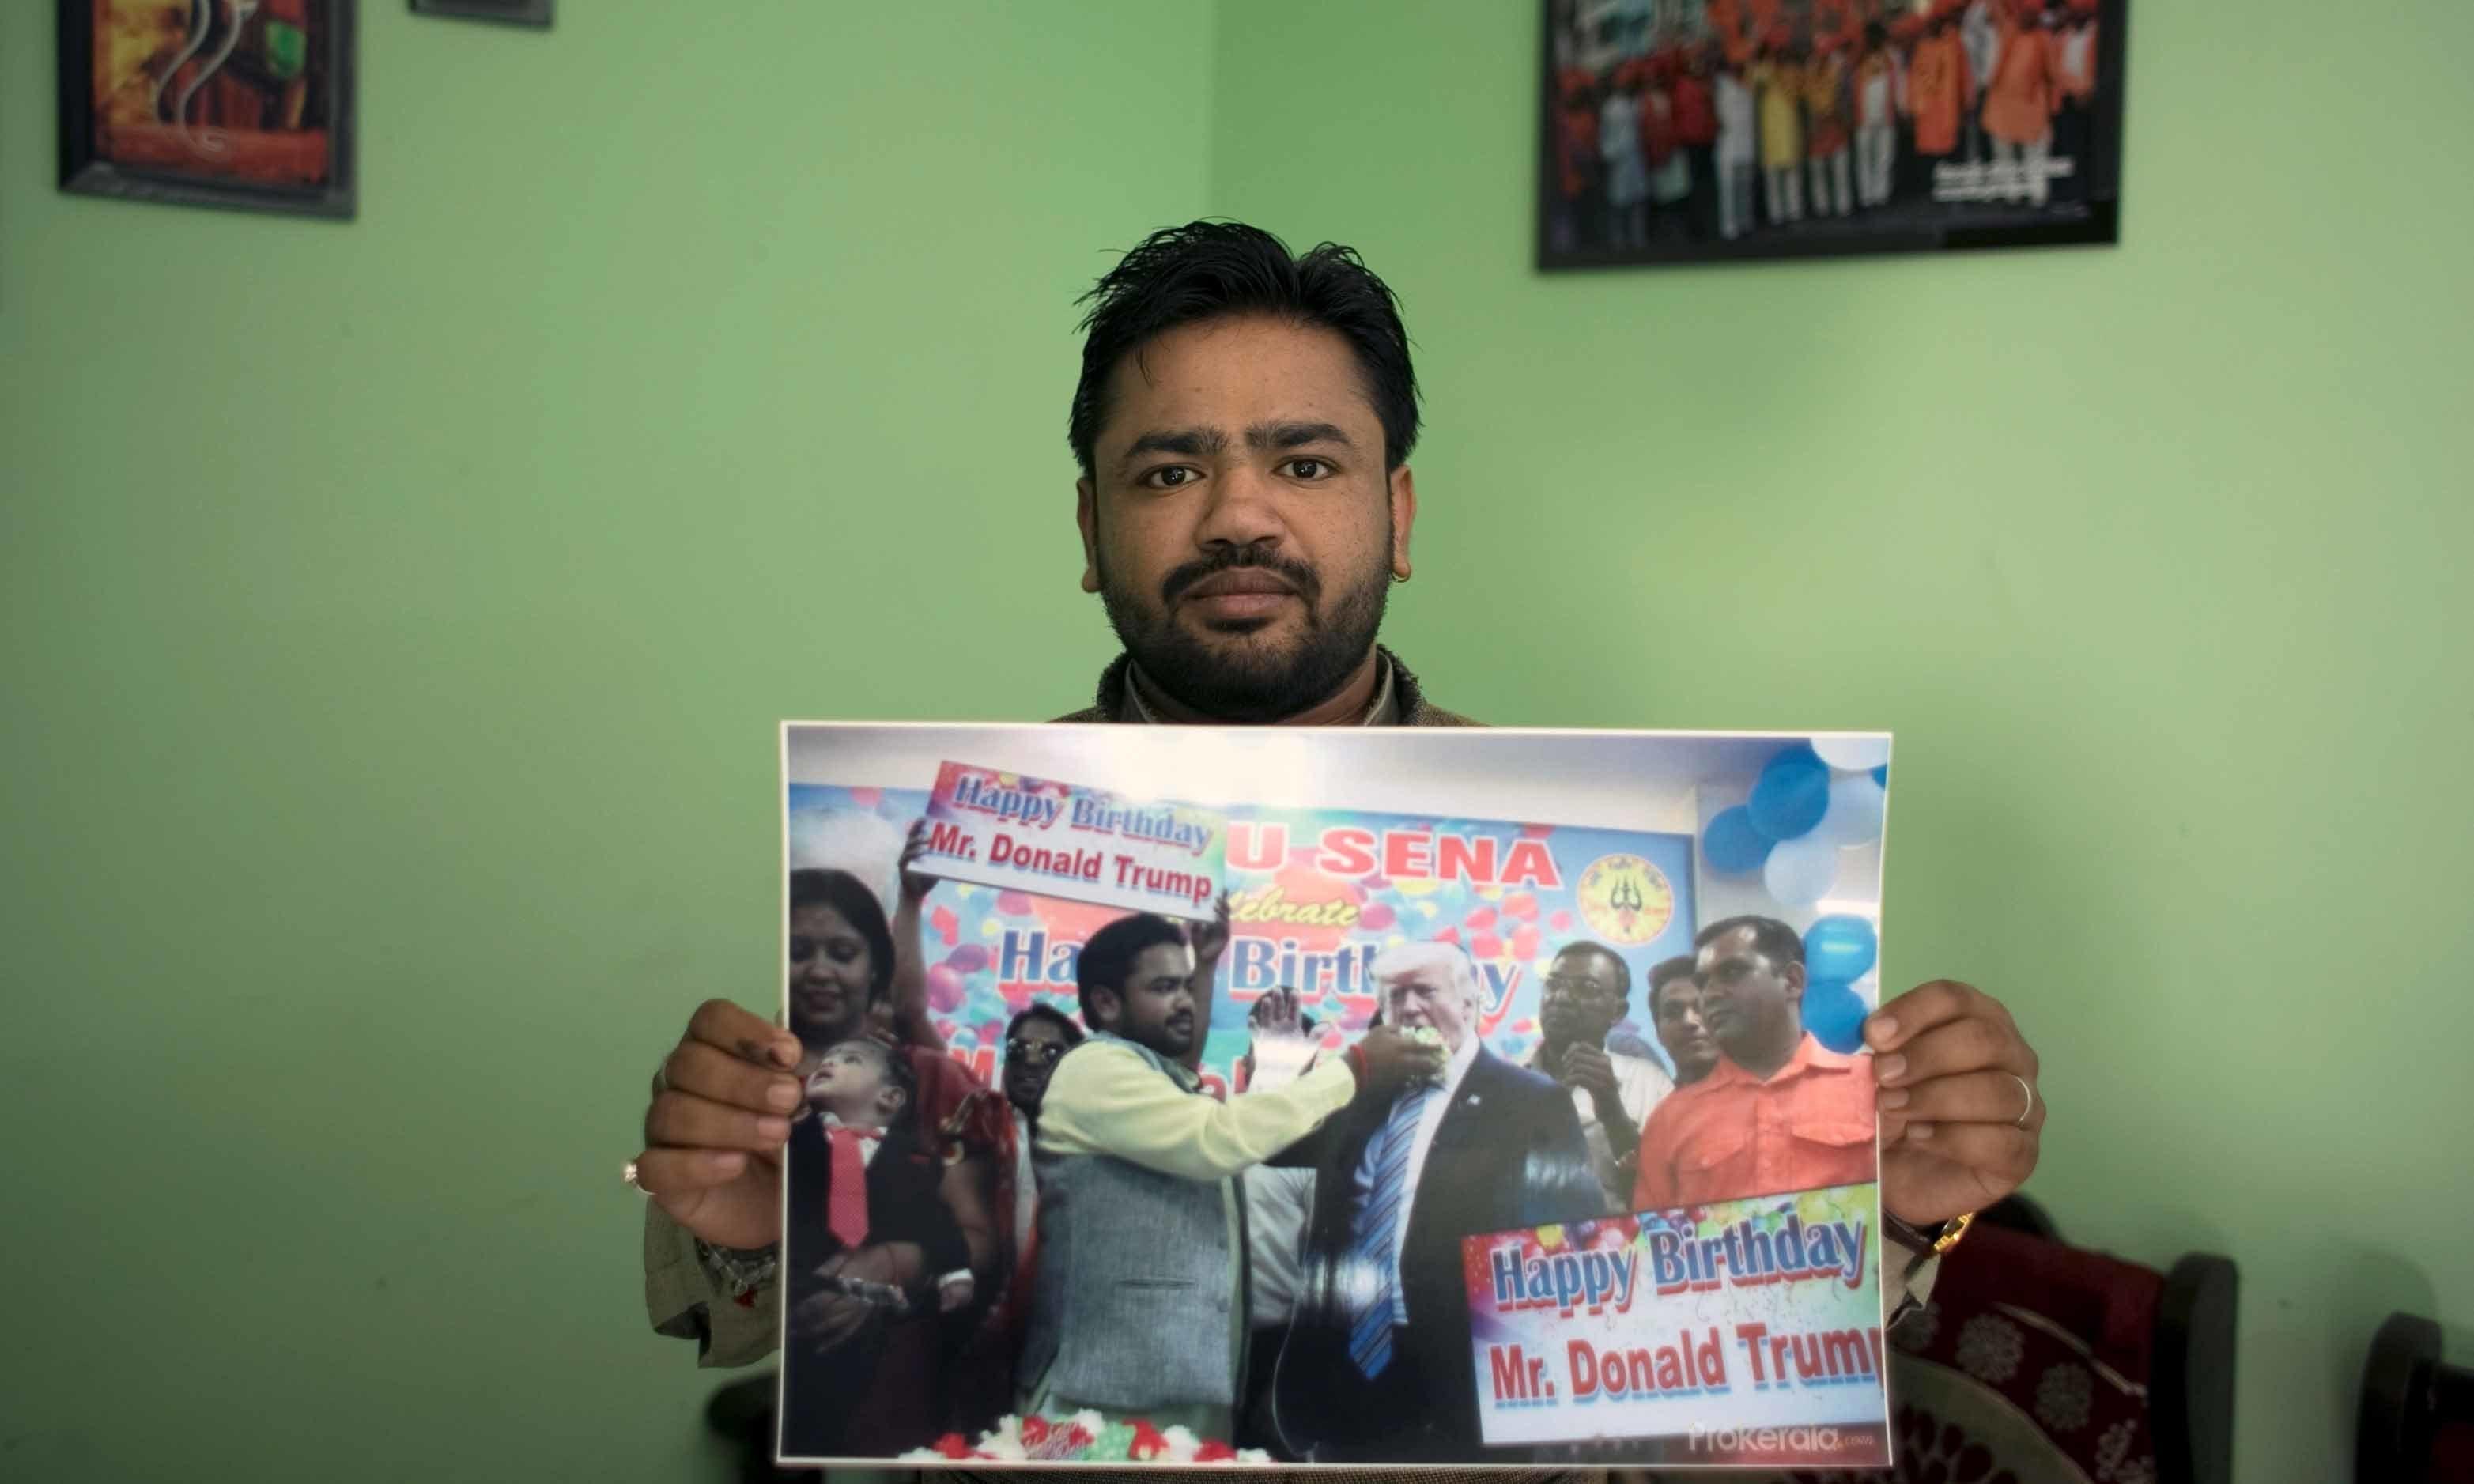 Vishnu Gupta, President of Shiv Sena, a Hindu hardline group, shows a picture of him celebrating US President Donald Trump's birthday, at his residence in New Delhi, India on February 13. — Reuters